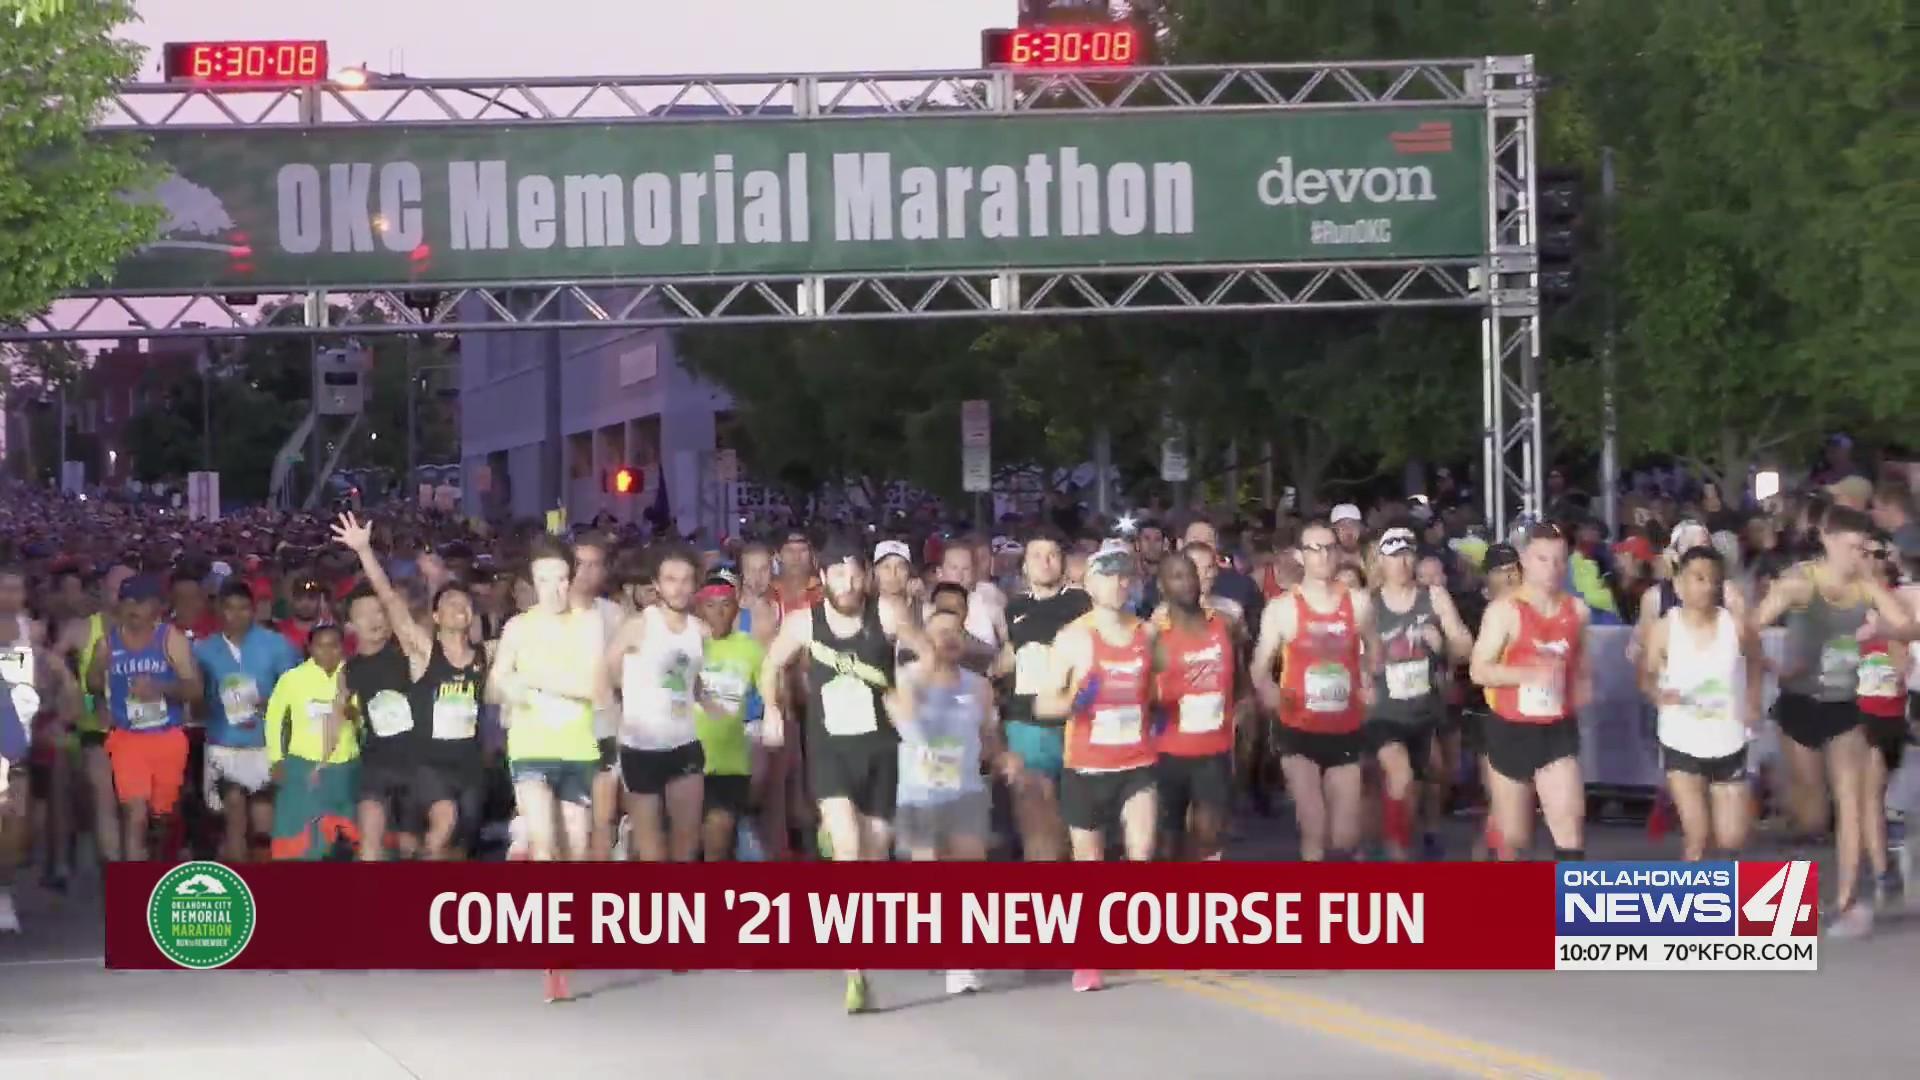 Run to Remember: Come run the Oklahoma City Memorial Marathon '21 with new course fun